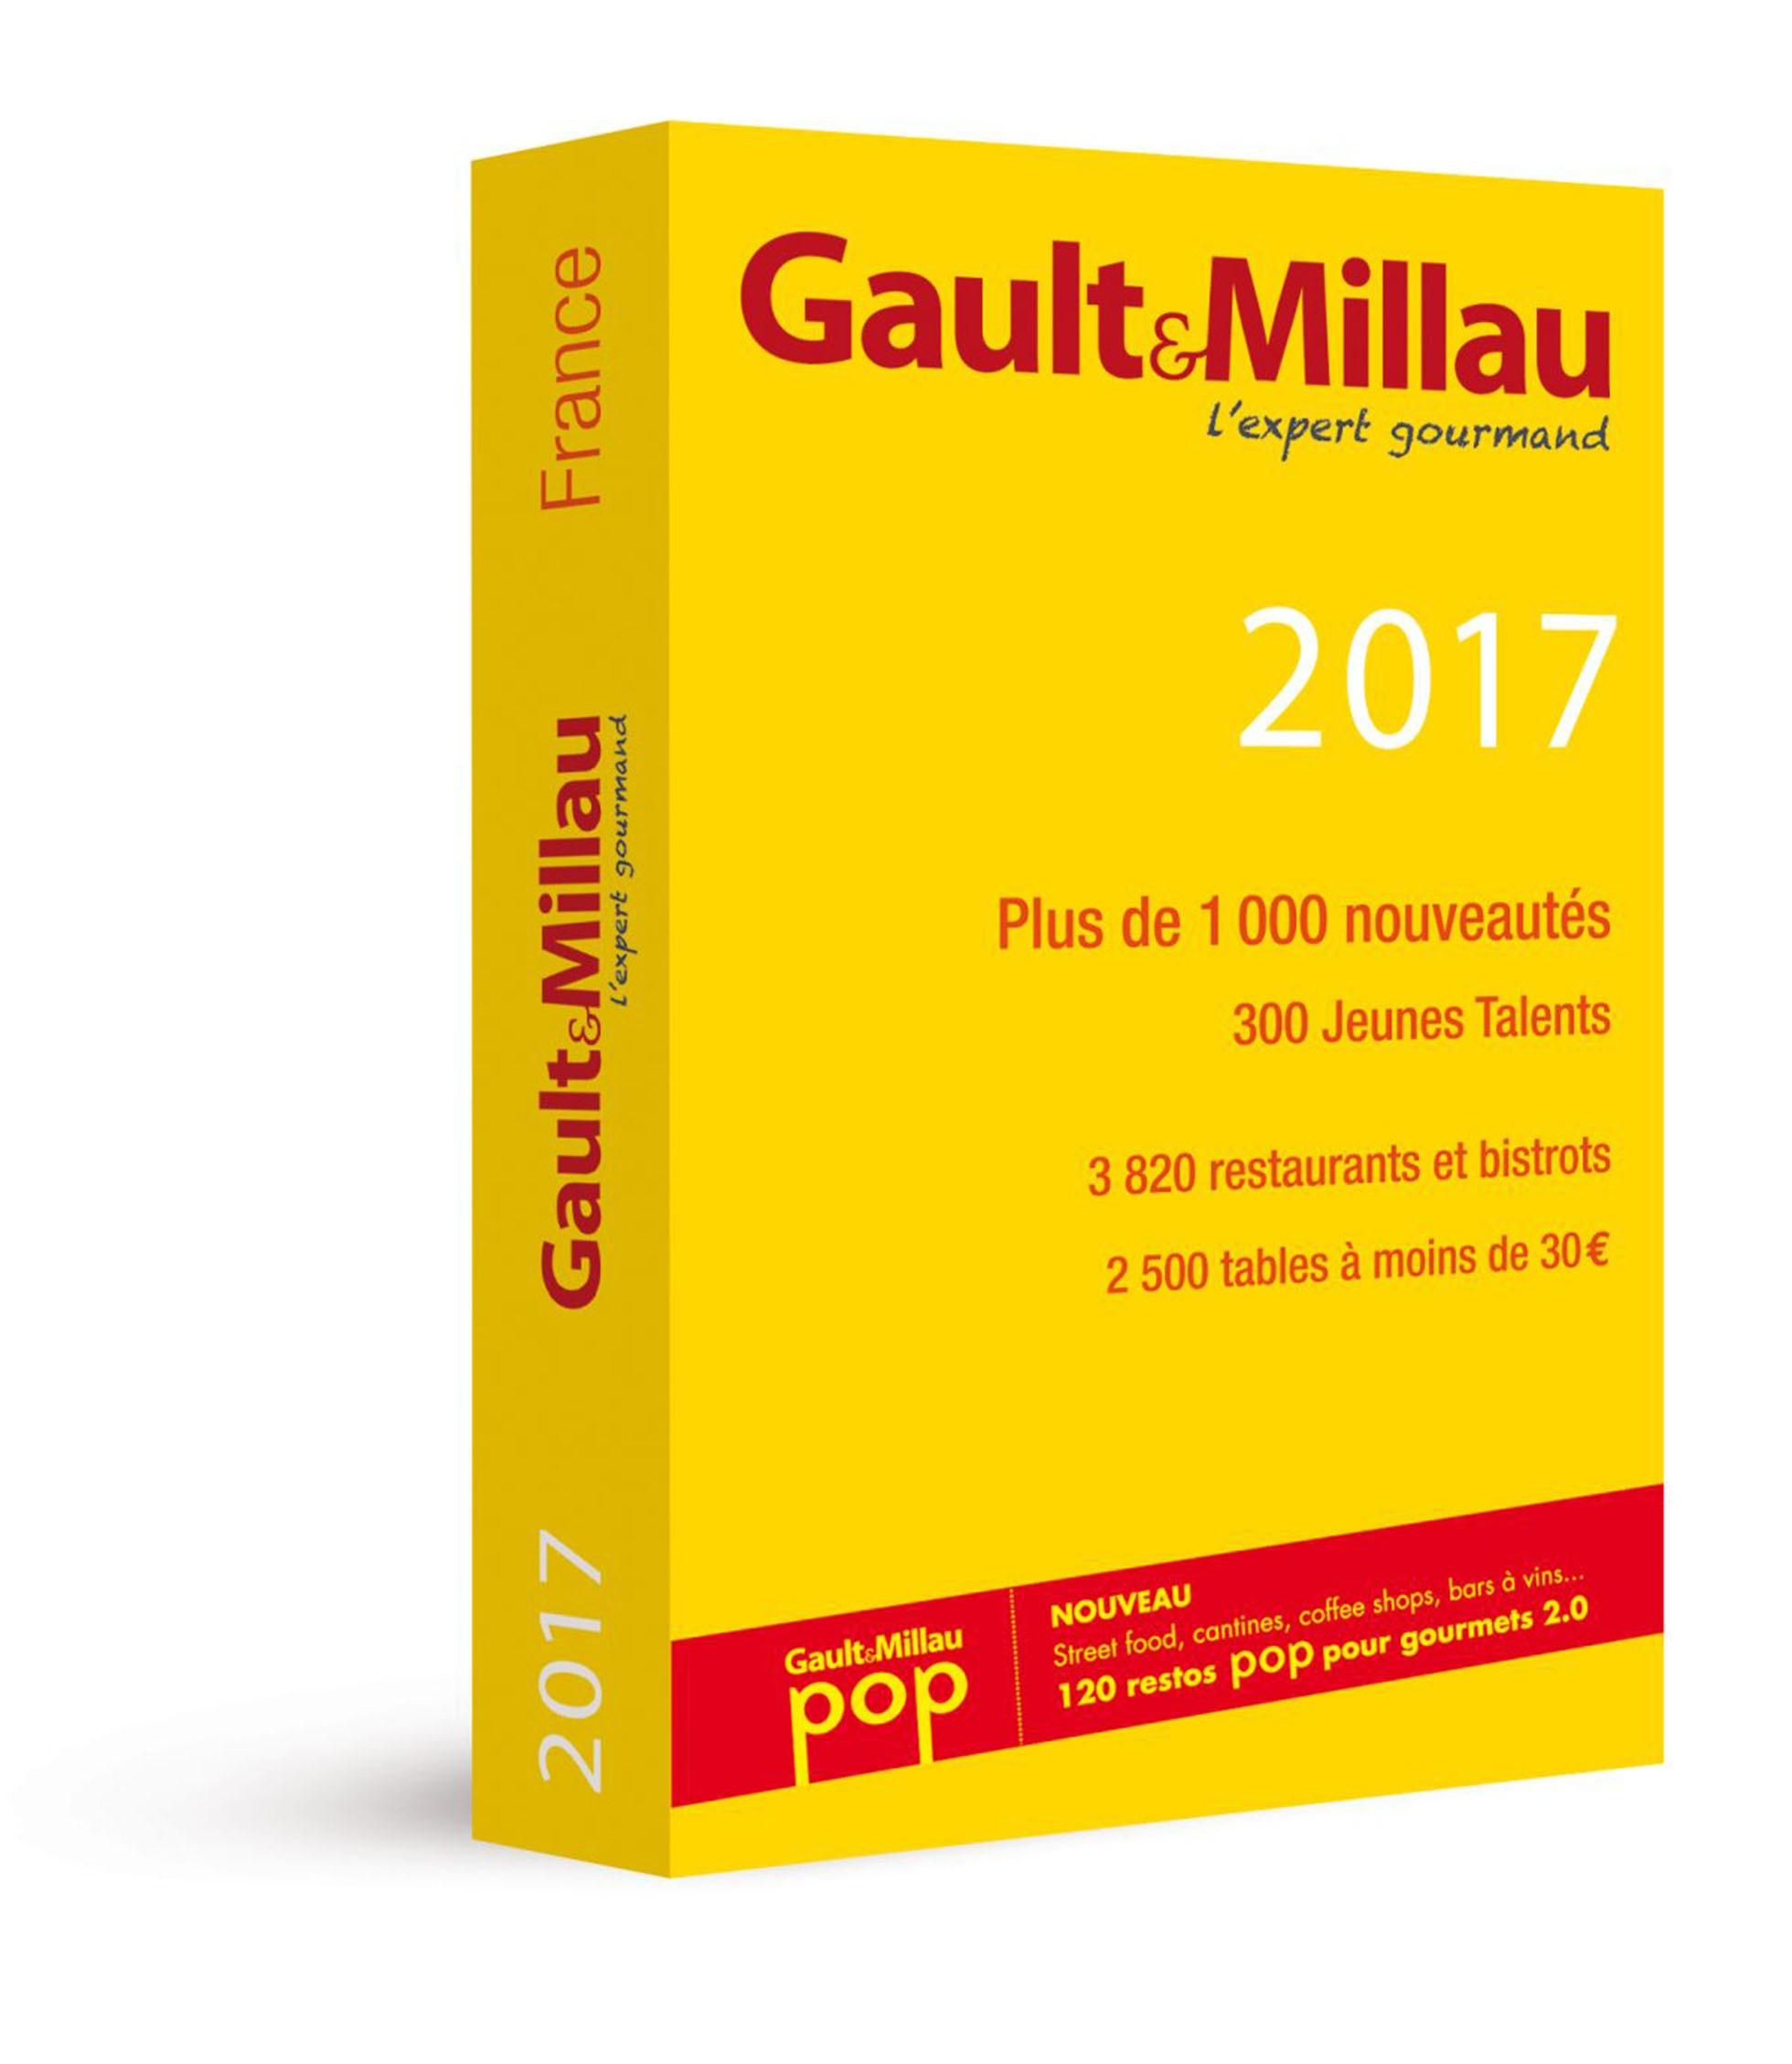 Gault et Millau - 2013